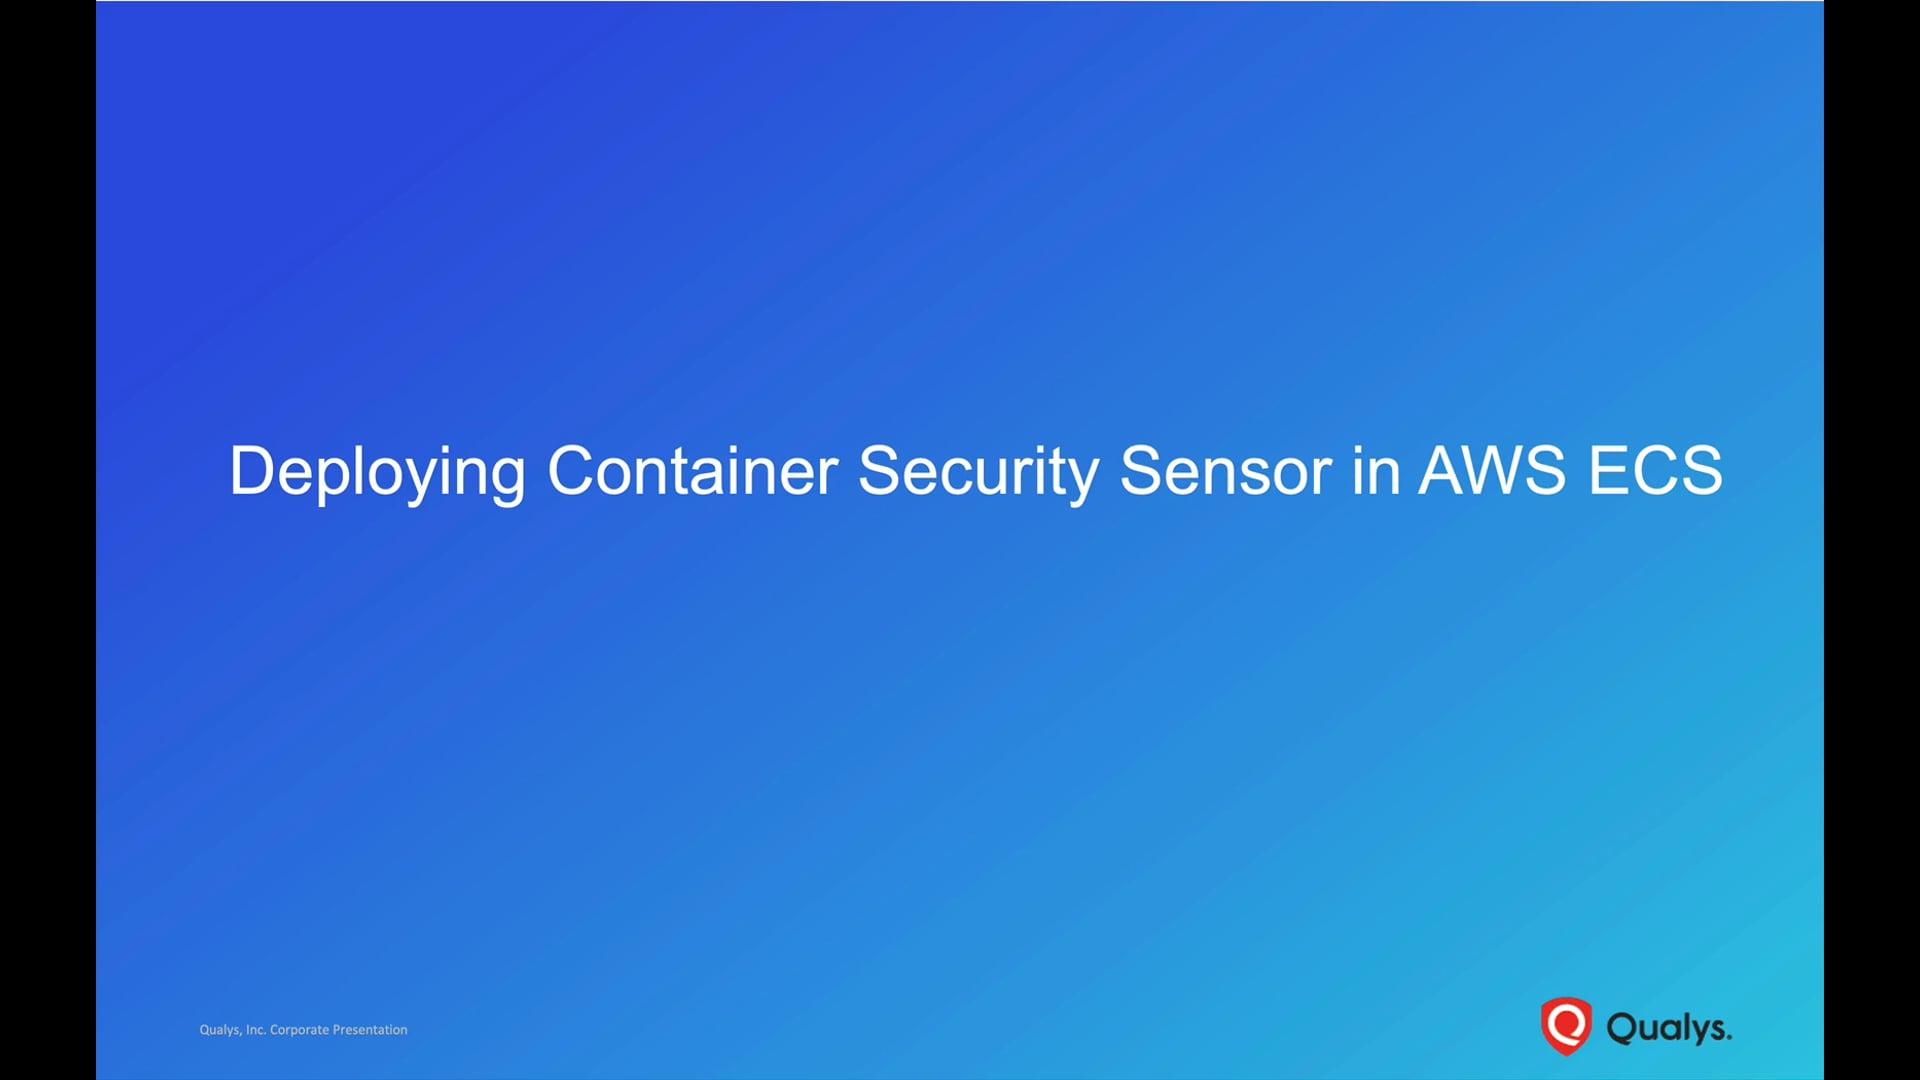 Deploying Container Security Sensor in AWS ECS